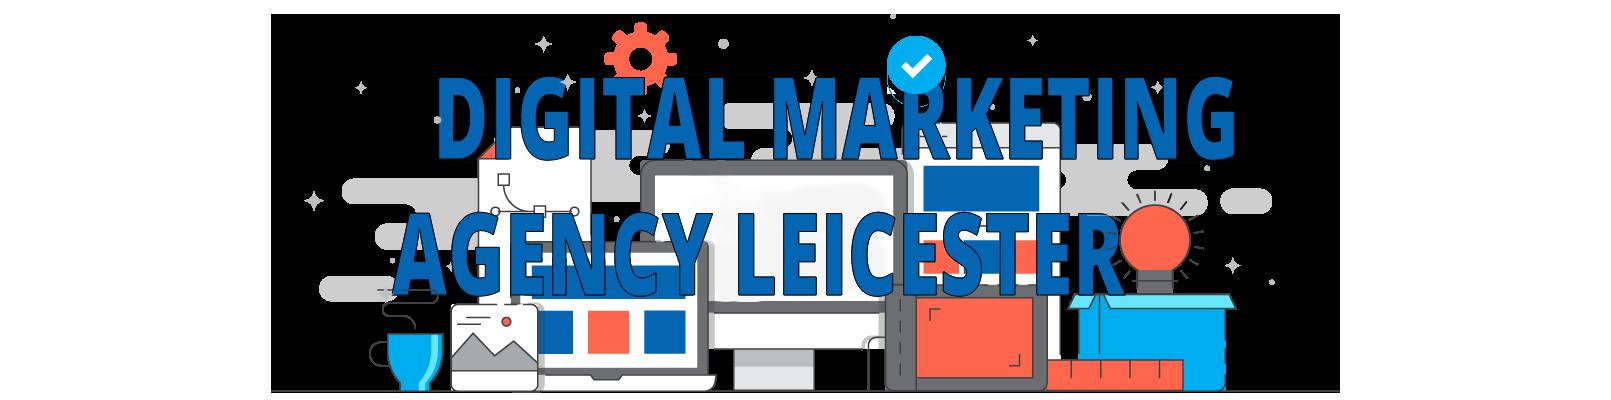 best digital marketing agency in Leicester